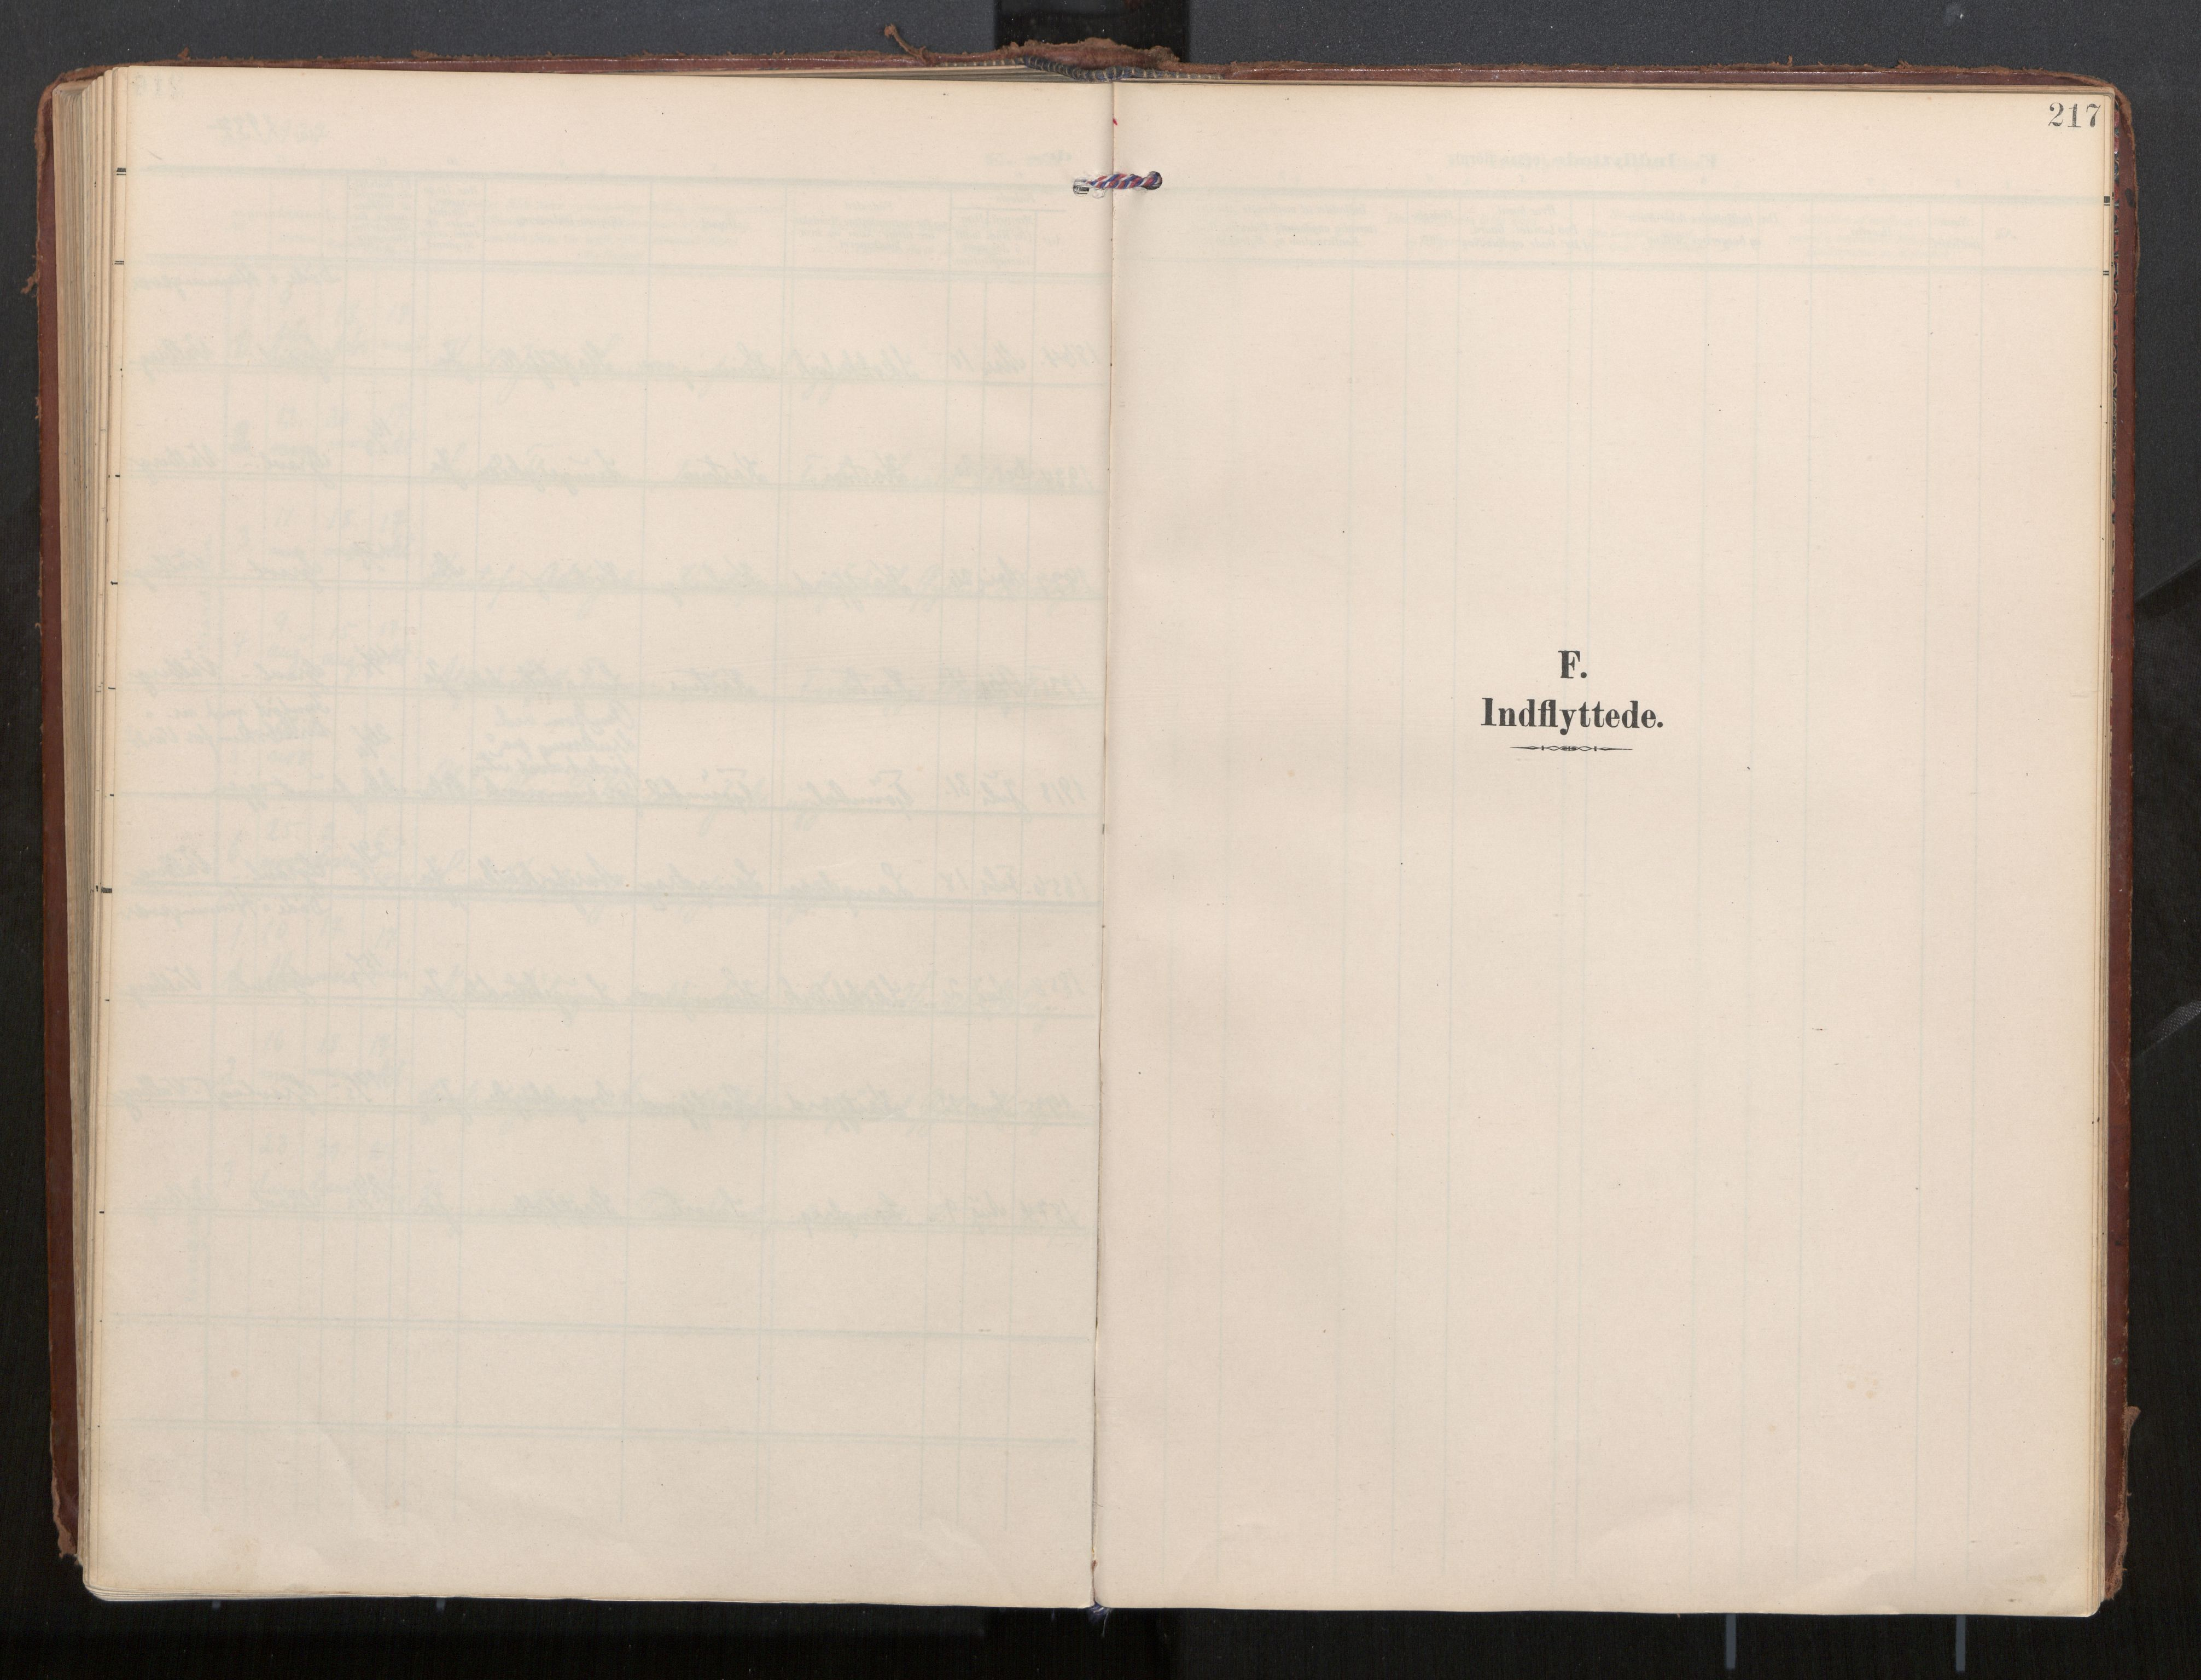 SAT, Ministerialprotokoller, klokkerbøker og fødselsregistre - Nordland, 884/L1194: Ministerialbok nr. 884A02, 1906-1937, s. 217